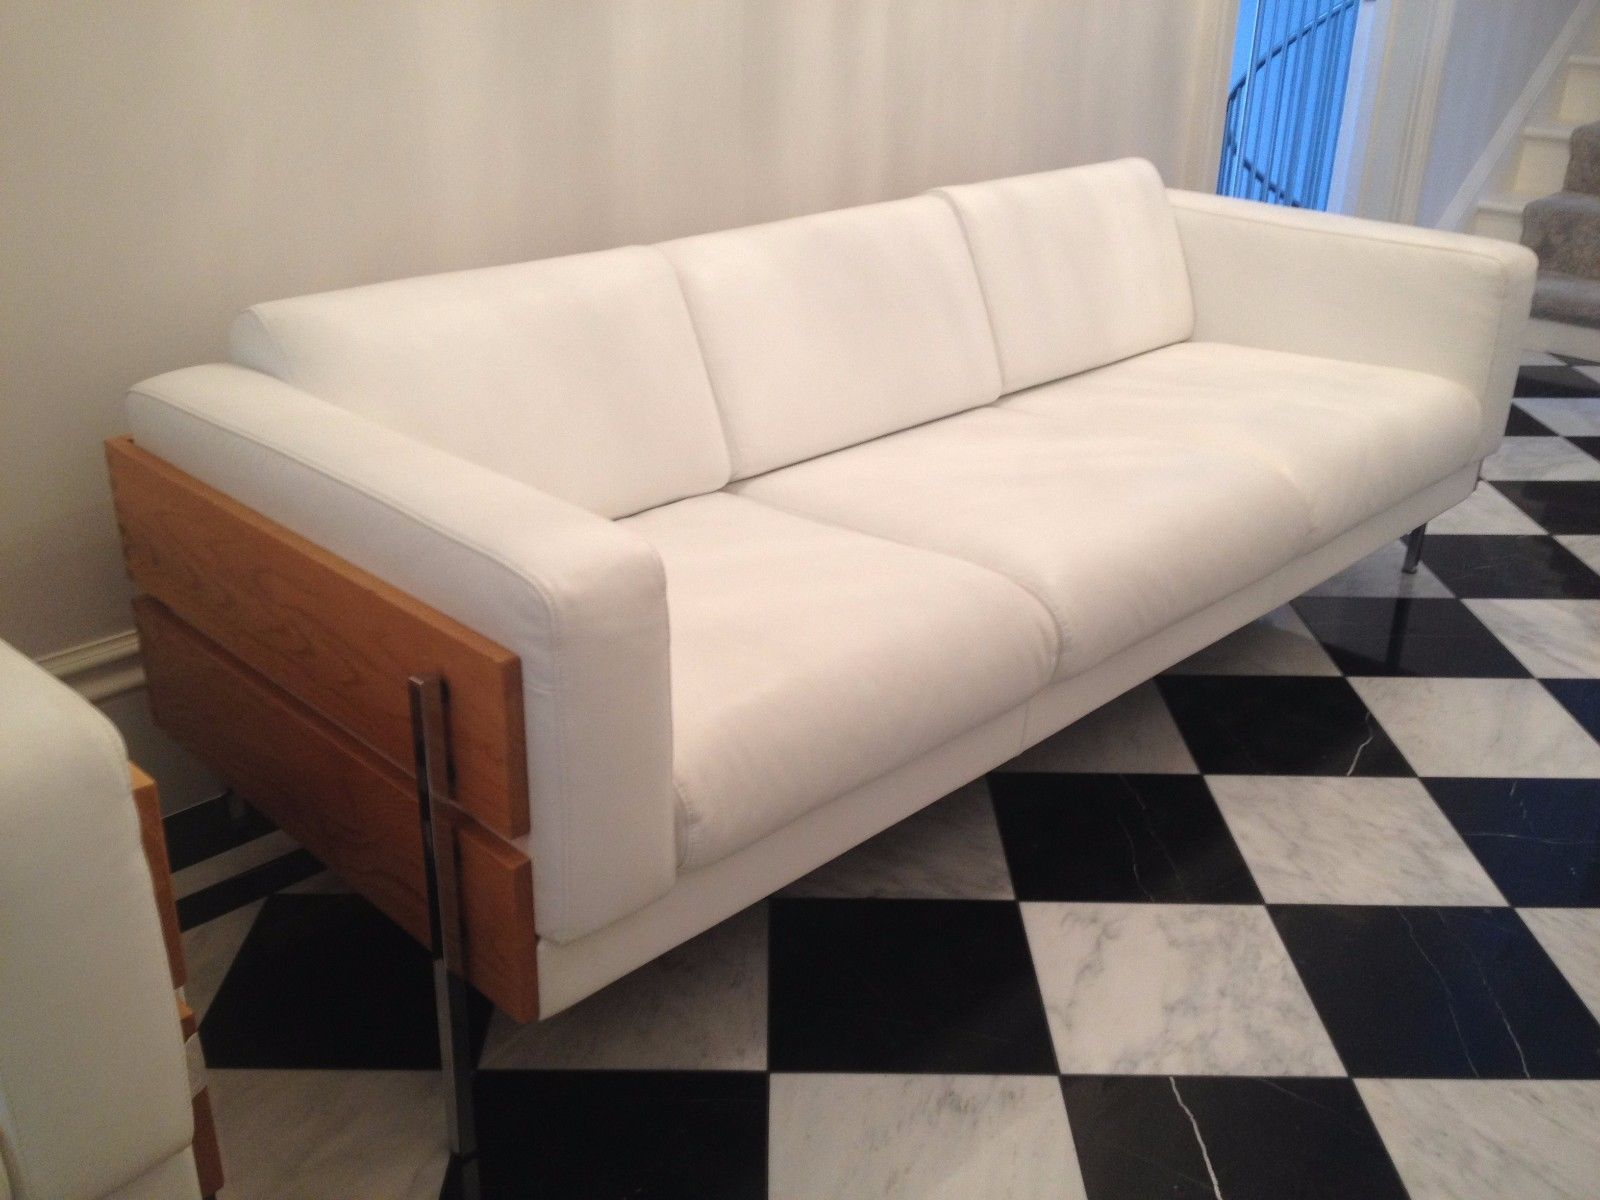 Stunning Habitat Robin Day Days Forum Rare White Leather Oak 3 Seat Sofa Ebay